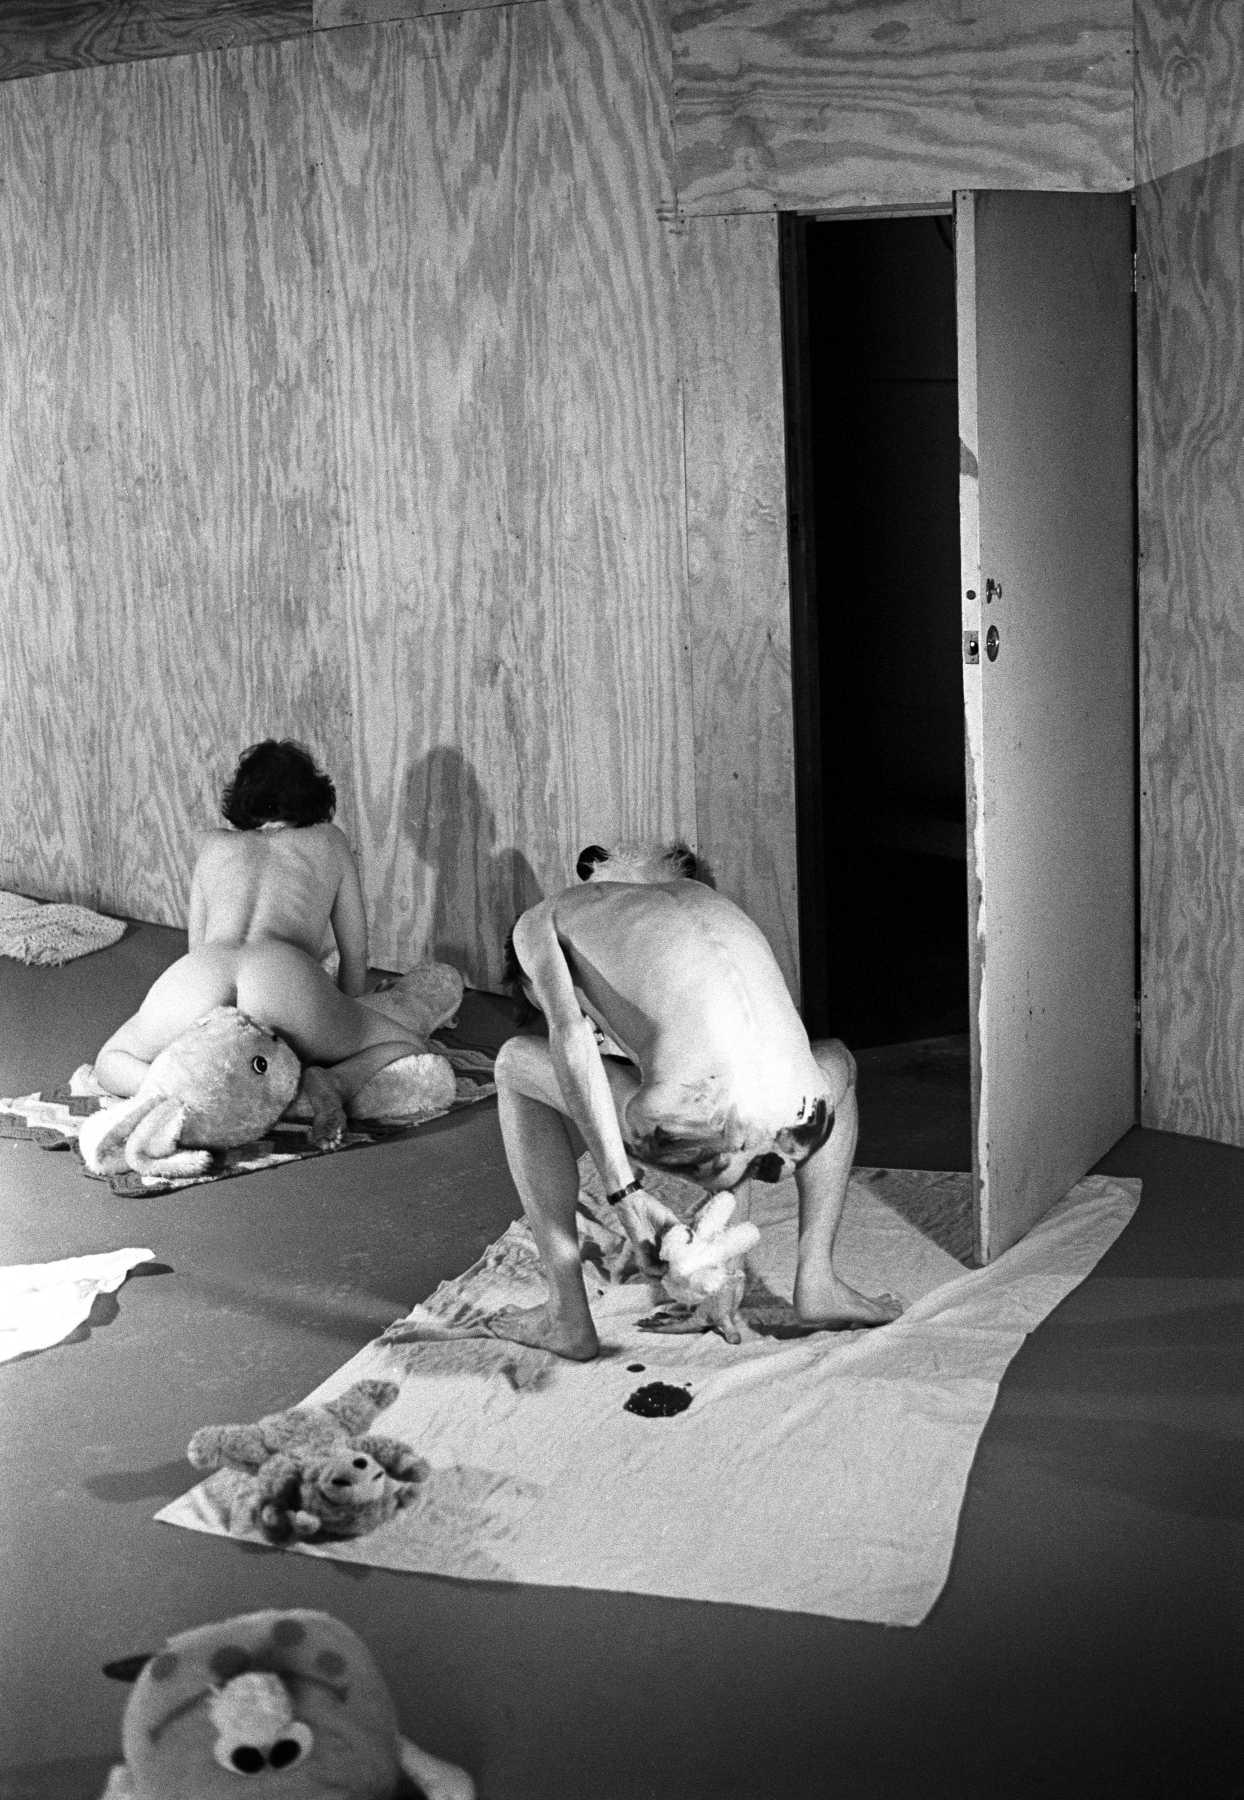 Detroit erotic art